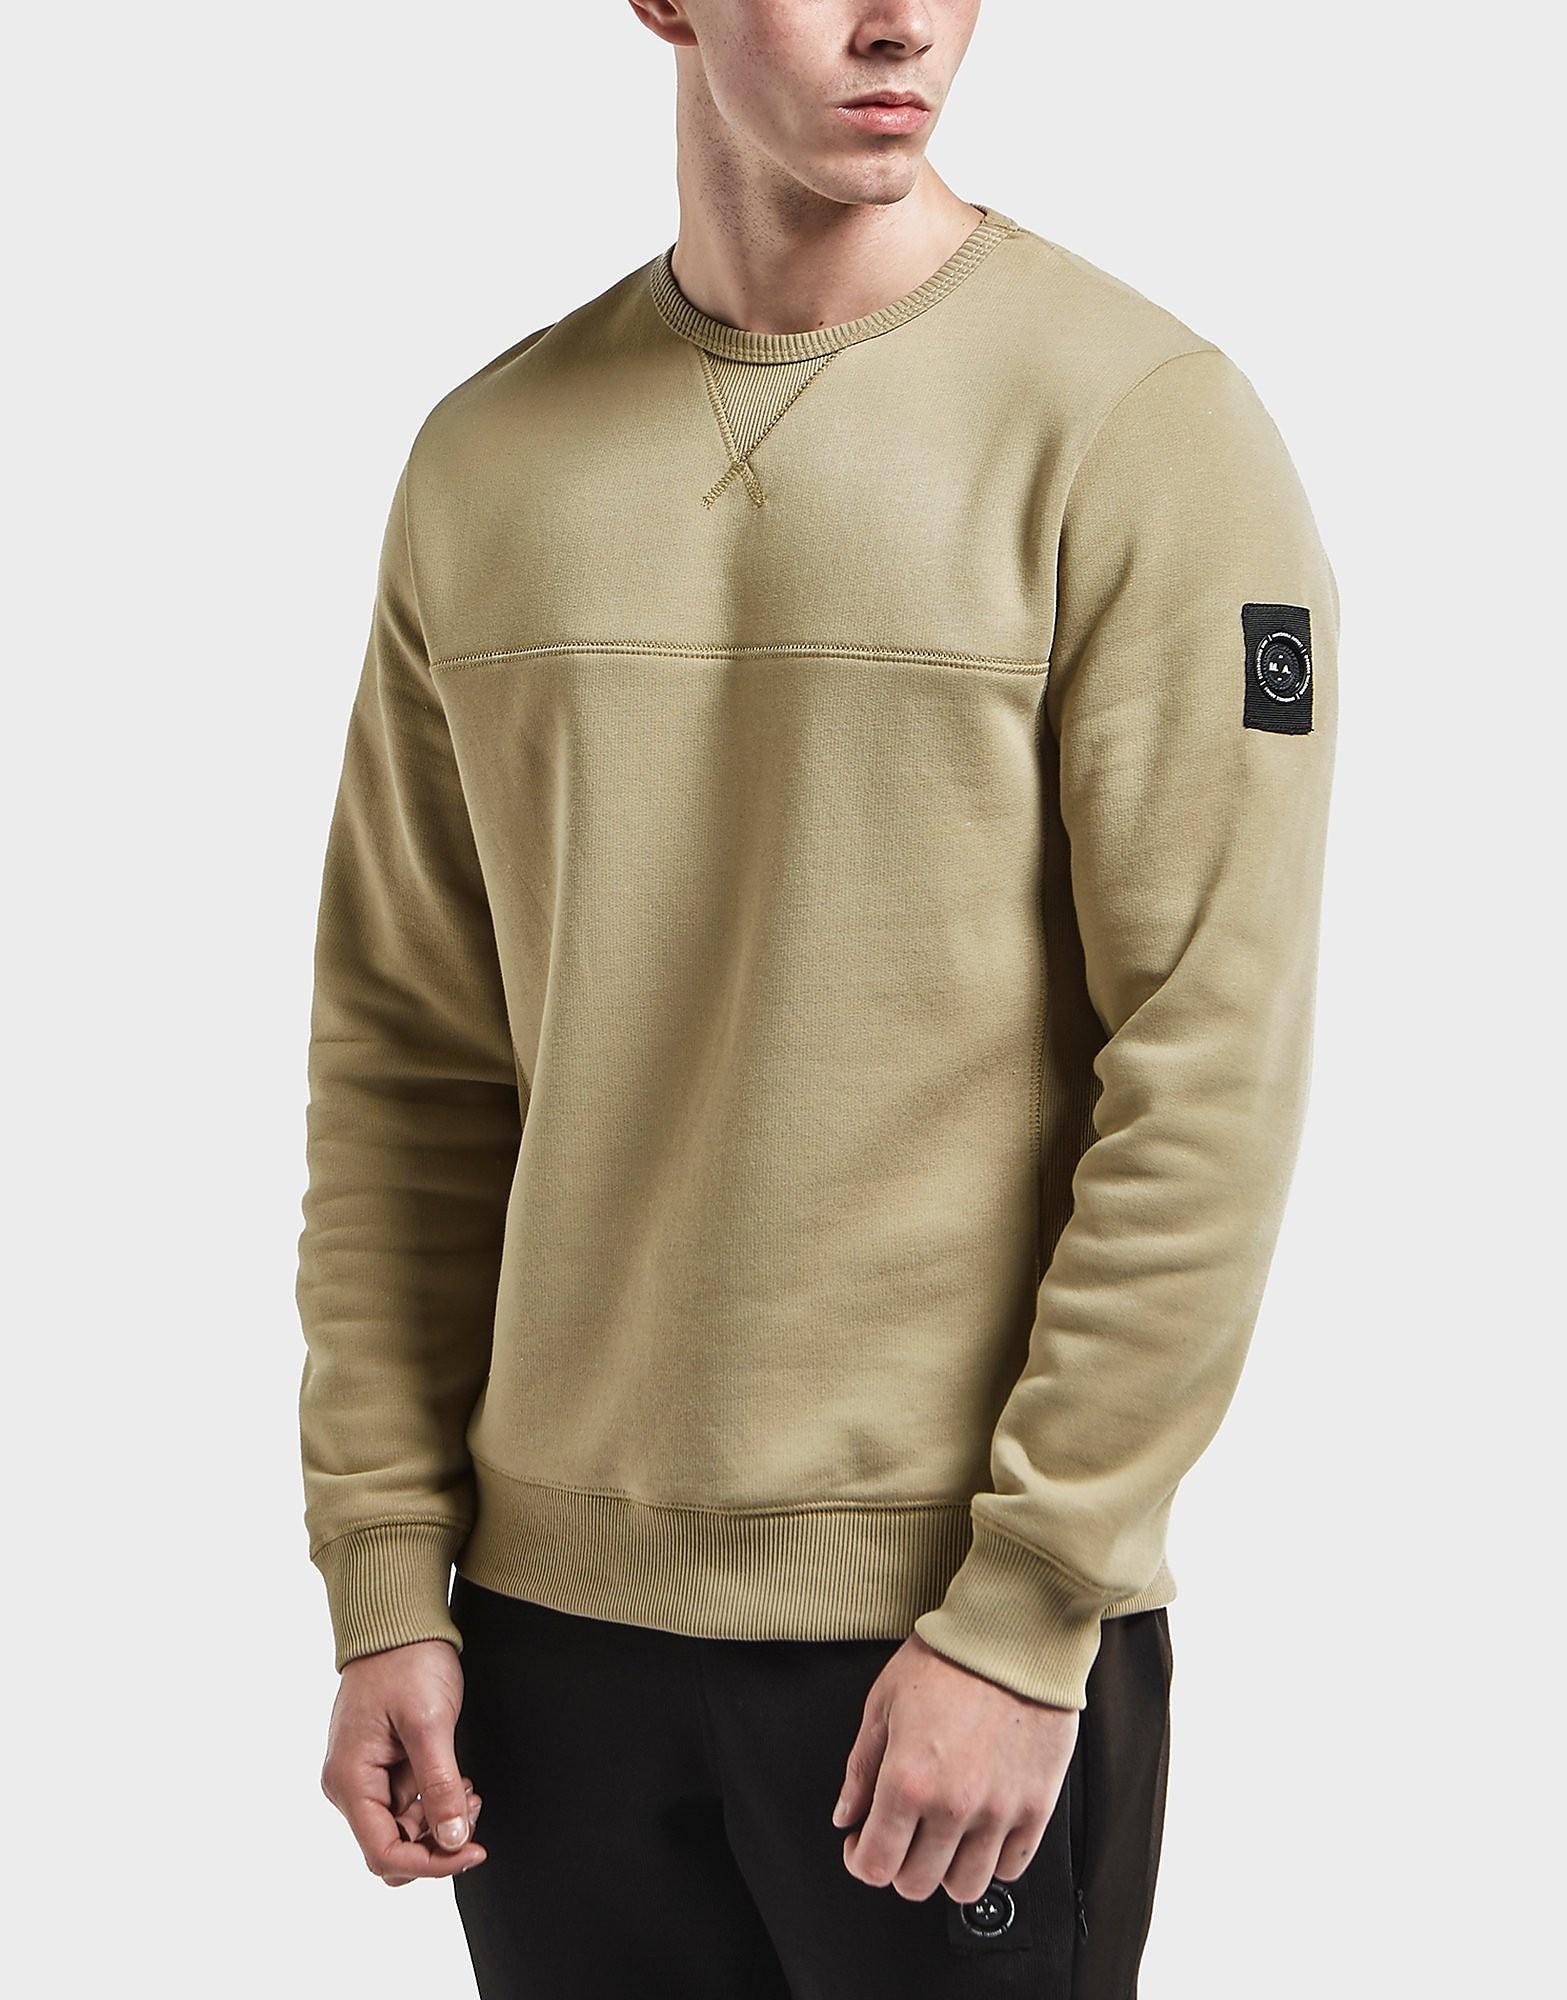 Marshall Artist Siren Crew Neck Sweatshirt